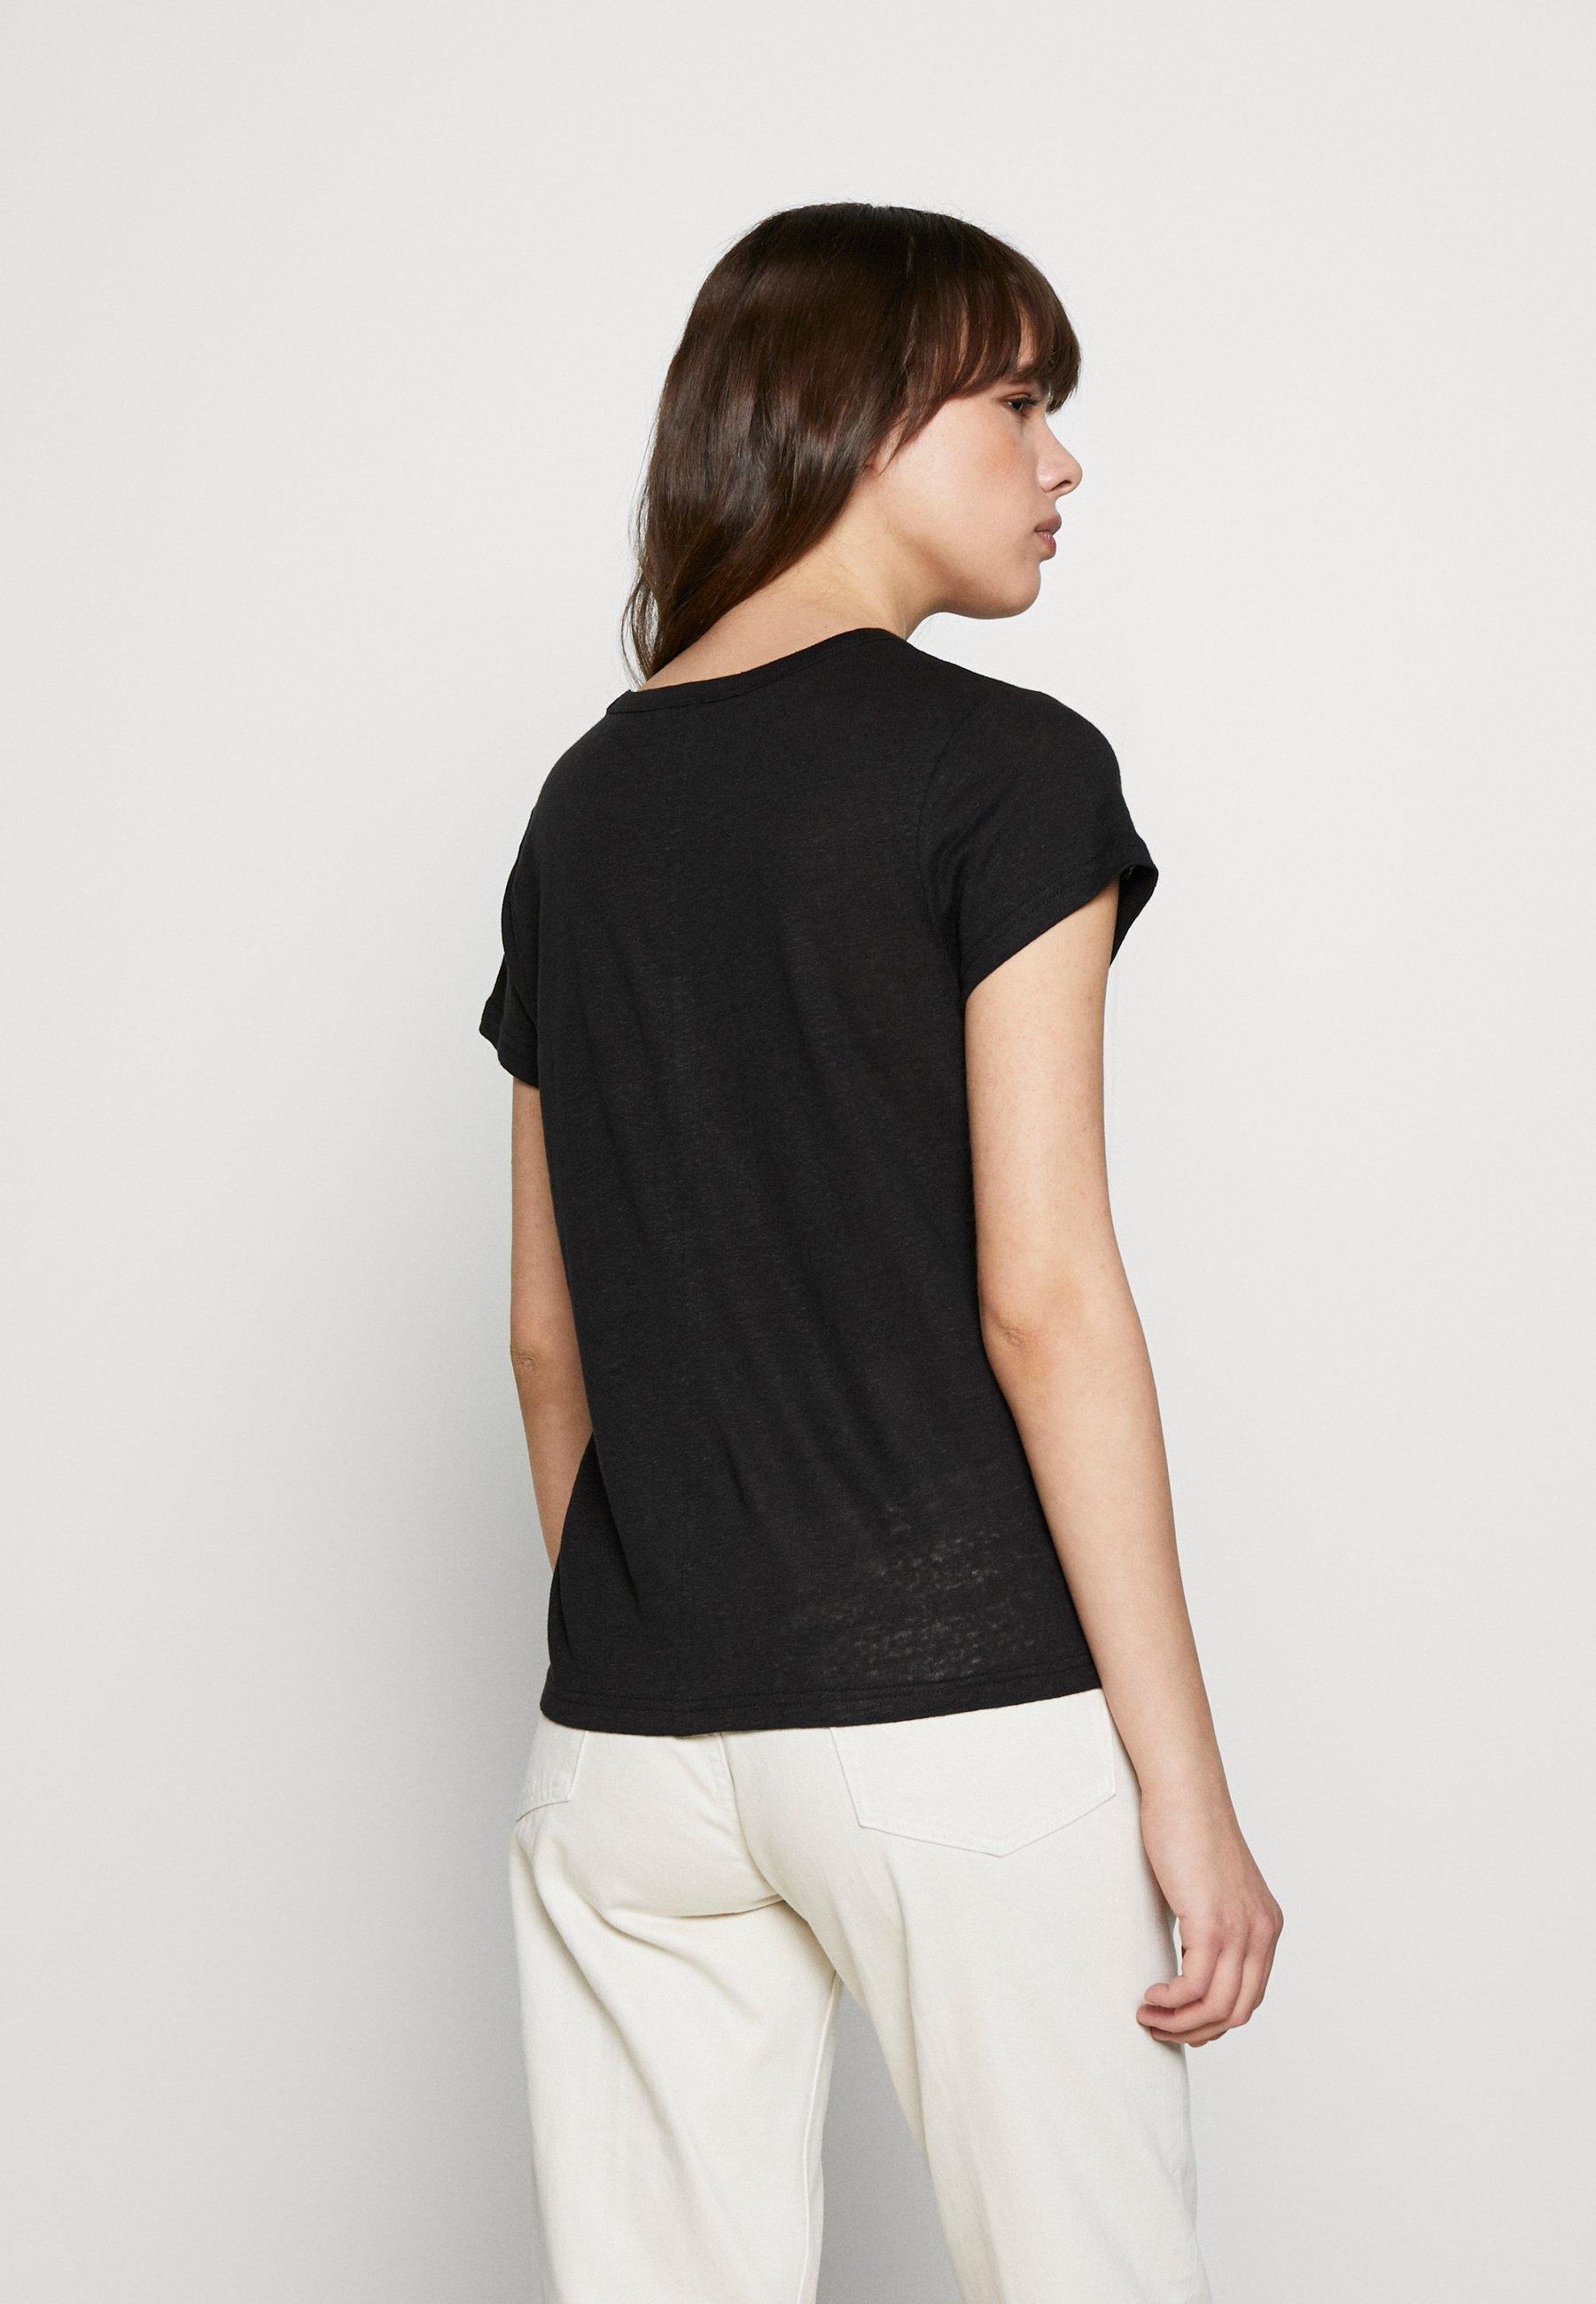 Banana Republic Vee Tee Solids - T-shirts Black/svart